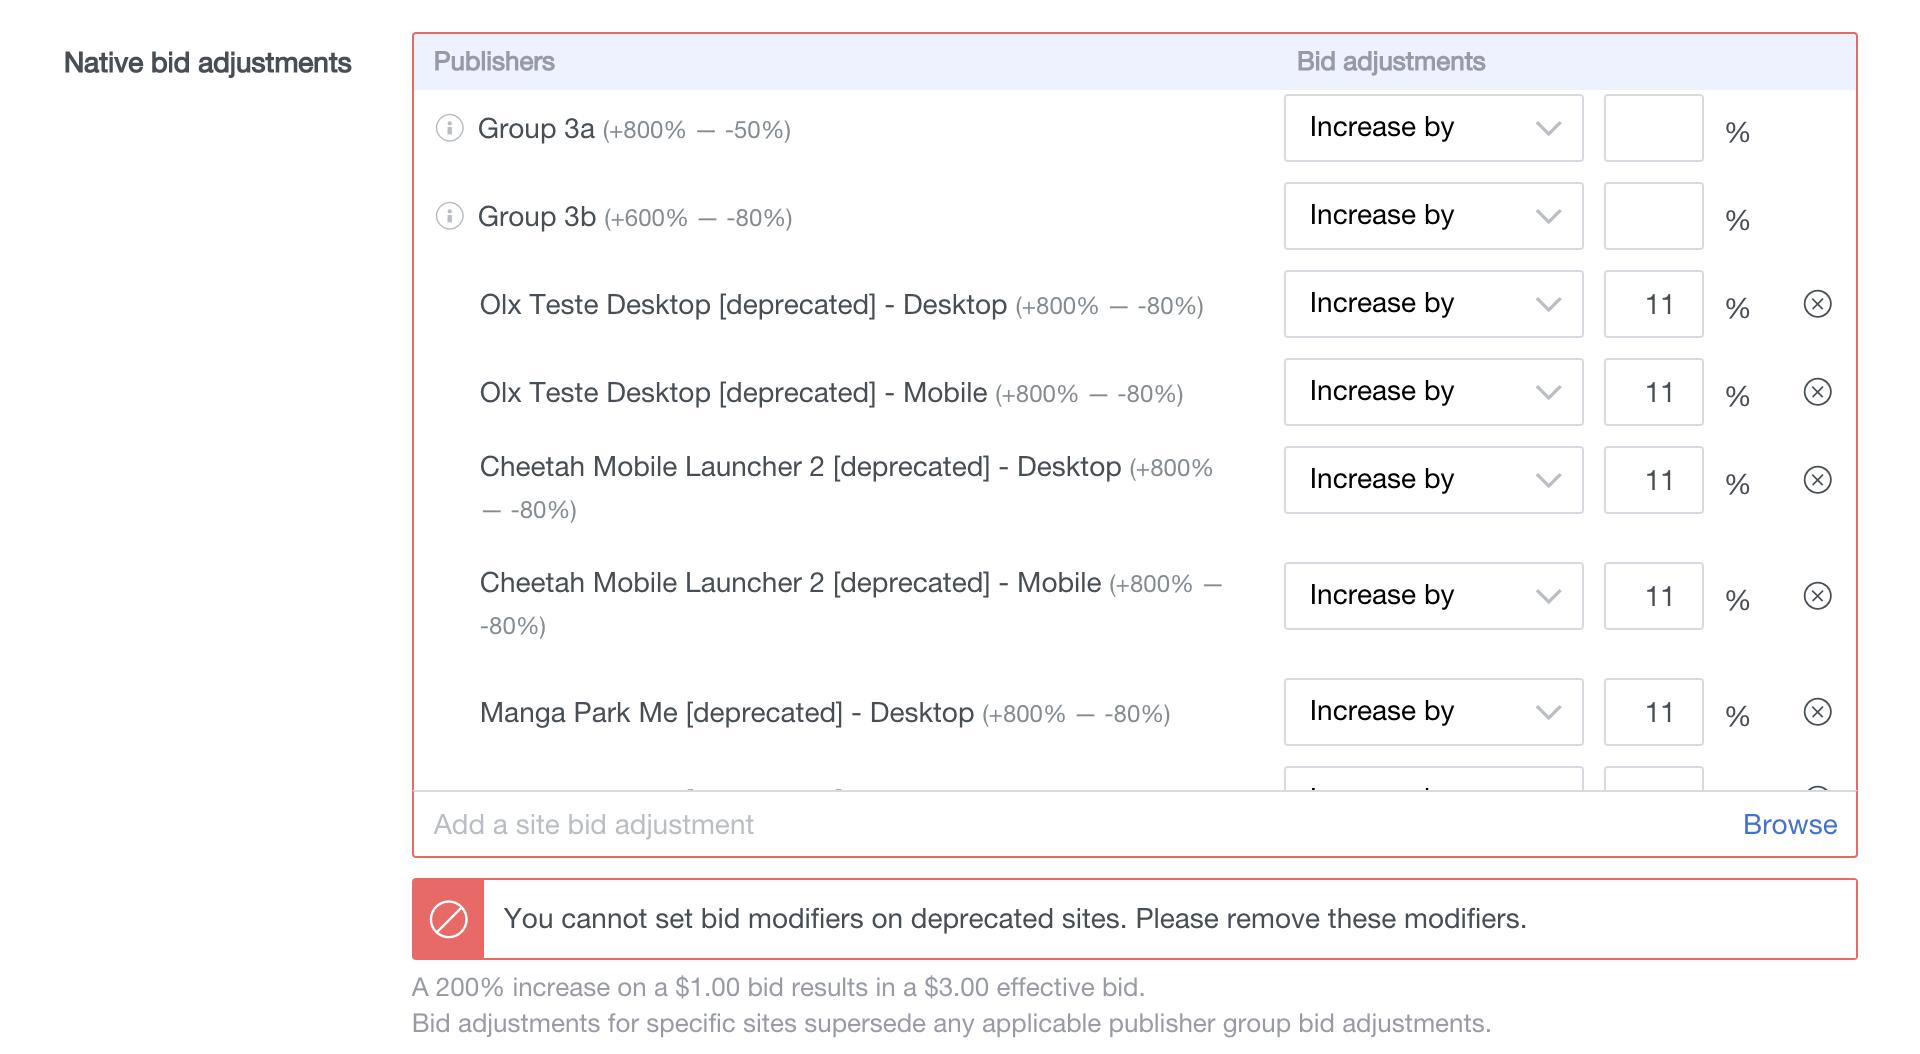 bid modifiers deprecated sites